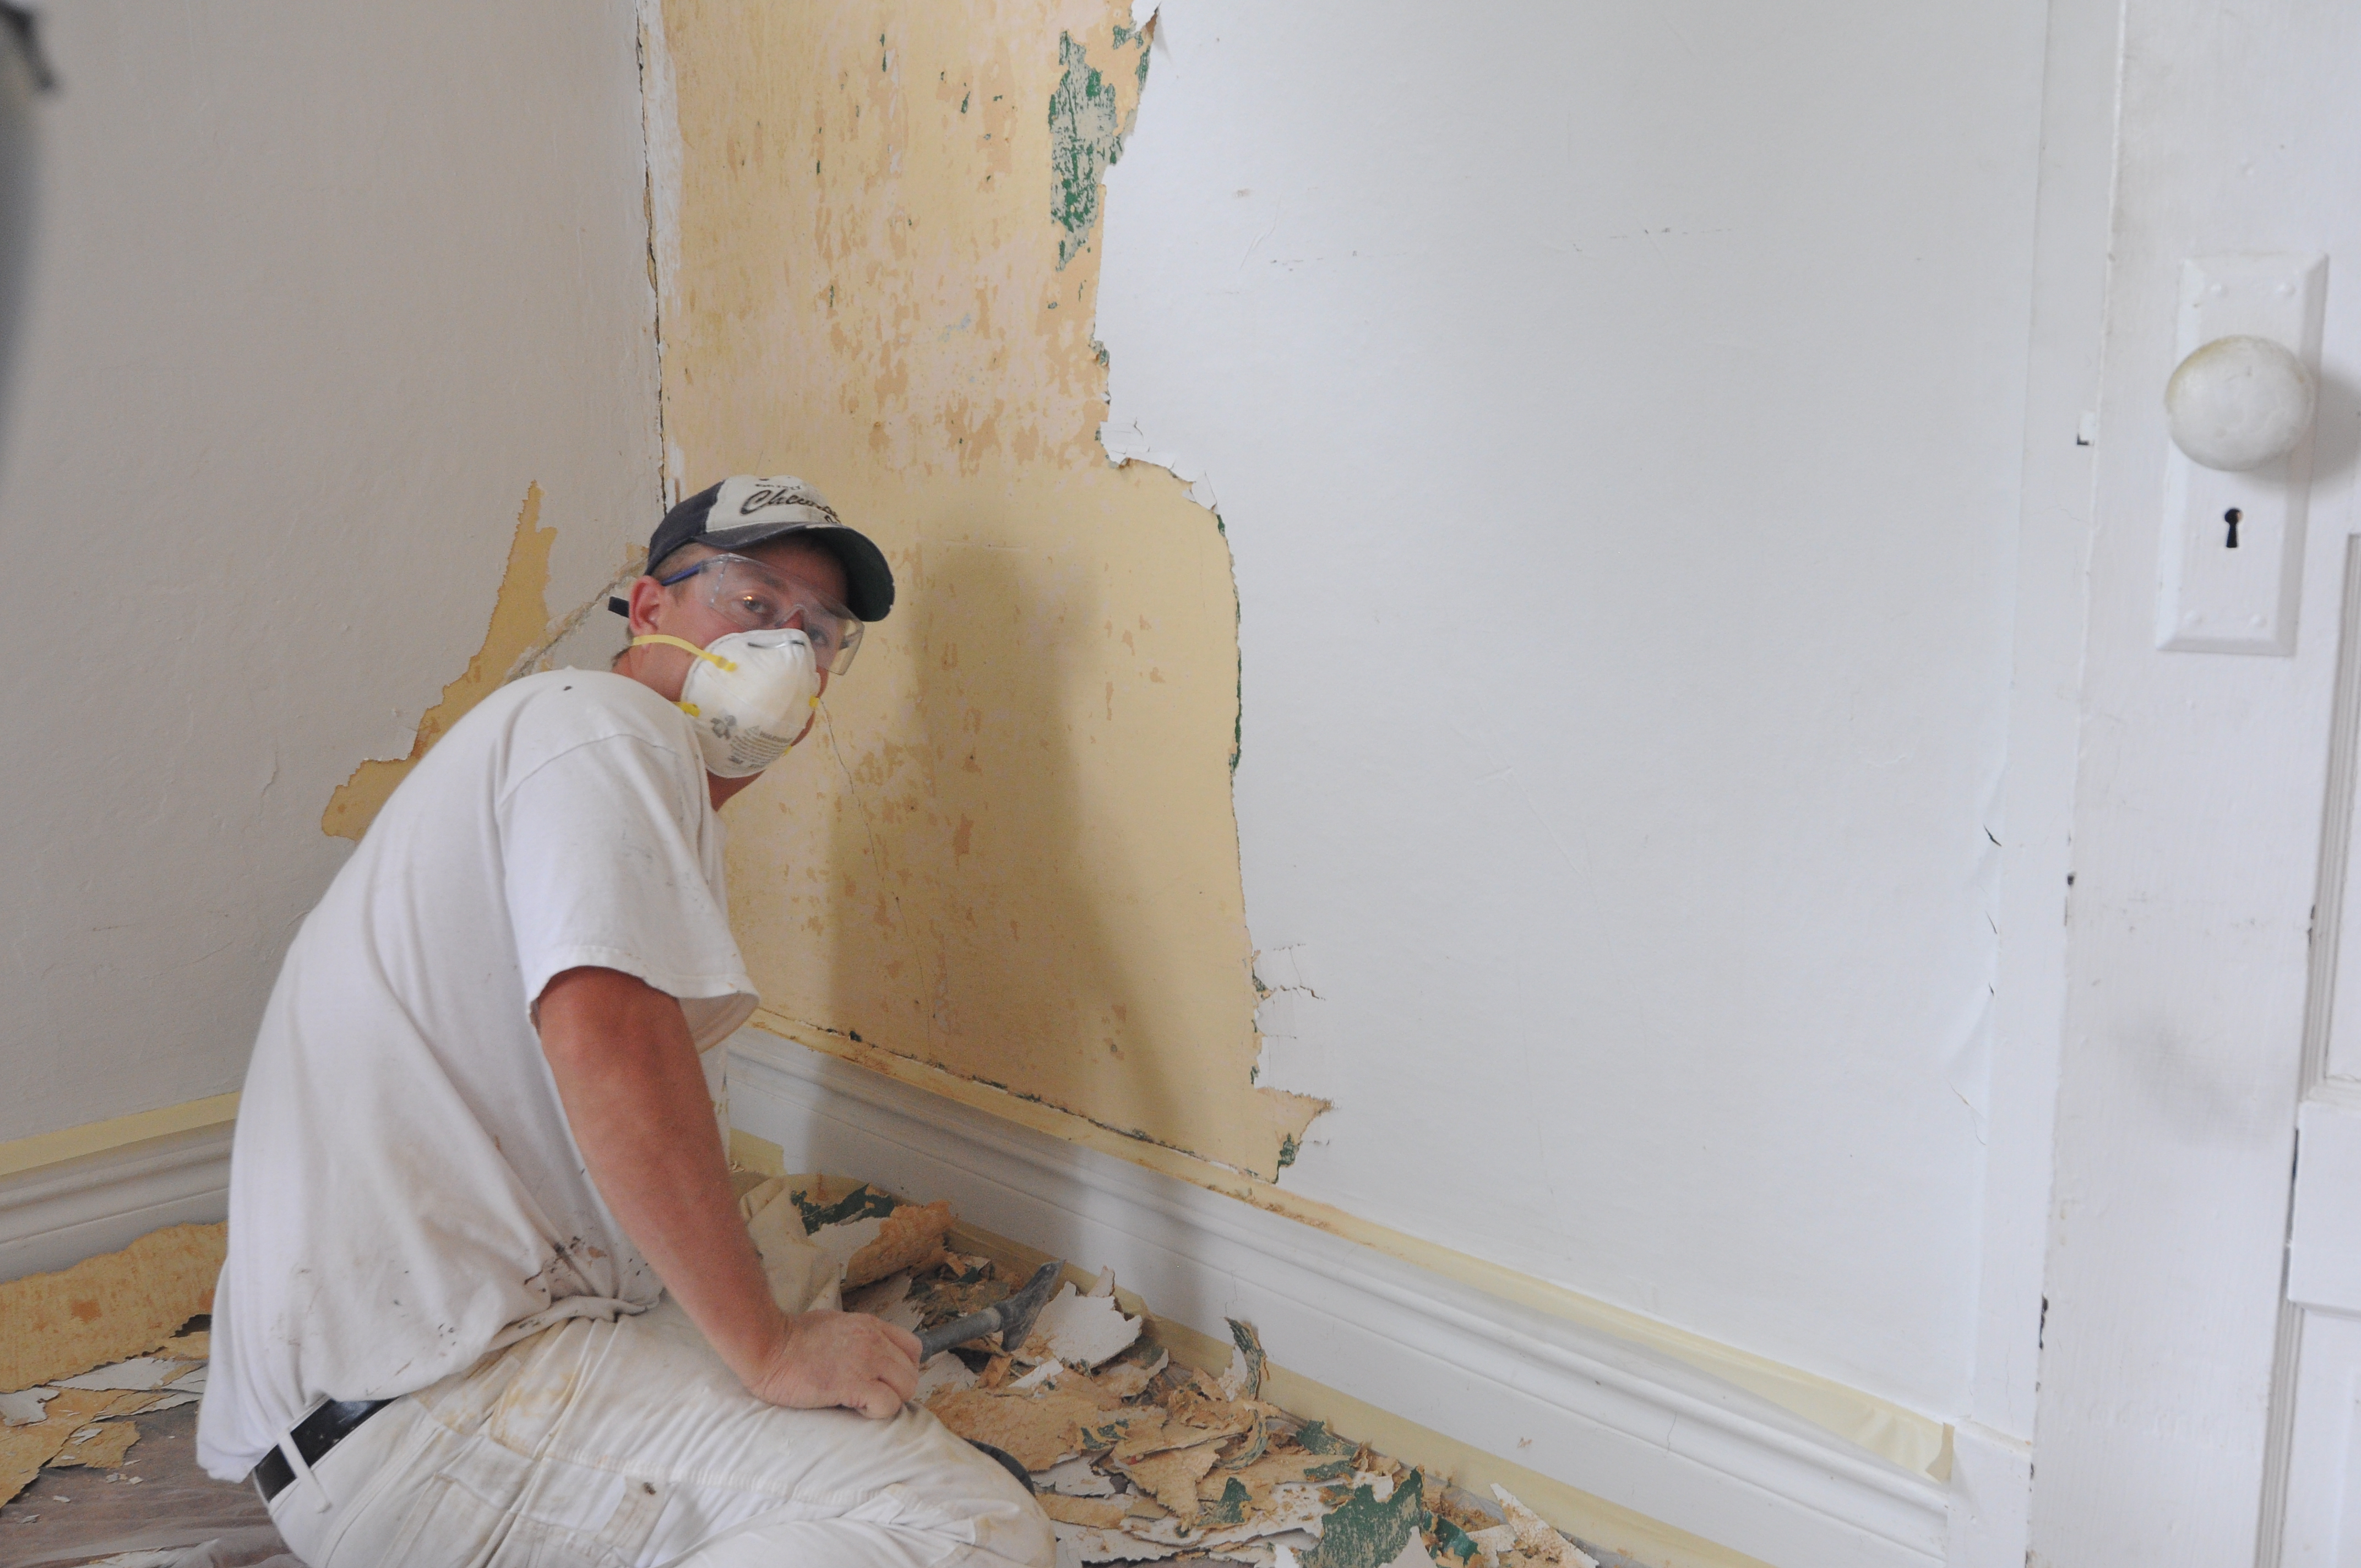 Removing wallpaper and repairing walls 4288x2848